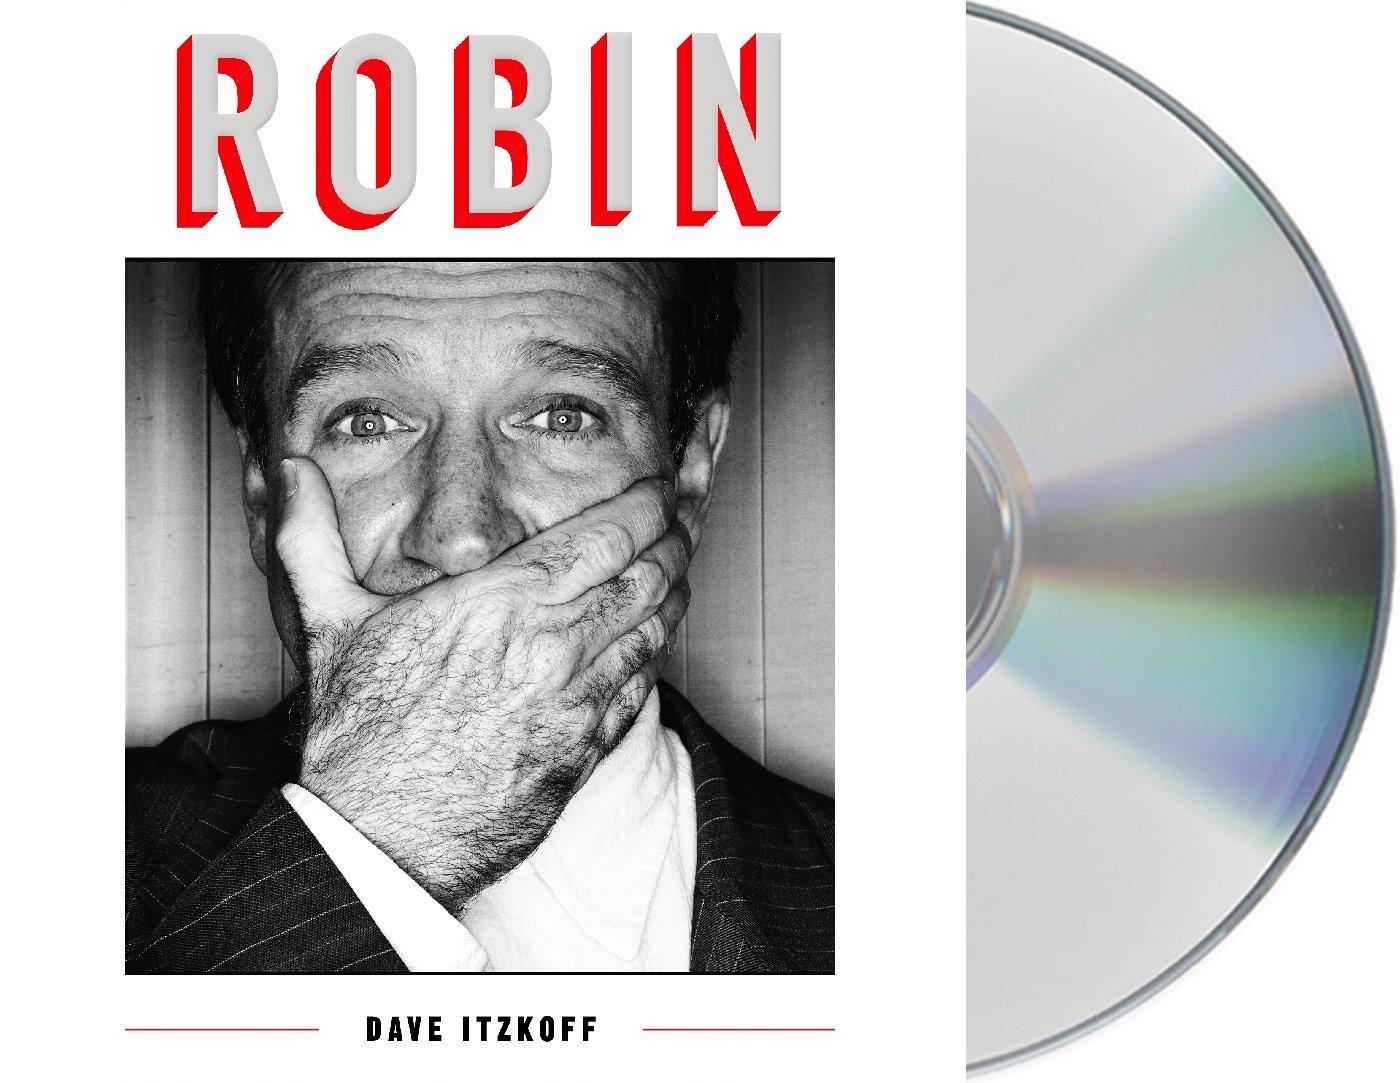 a14b0d1a868d1 Amazon.com: Robin (9781427296979): Dave Itzkoff, Fred Berman: Books